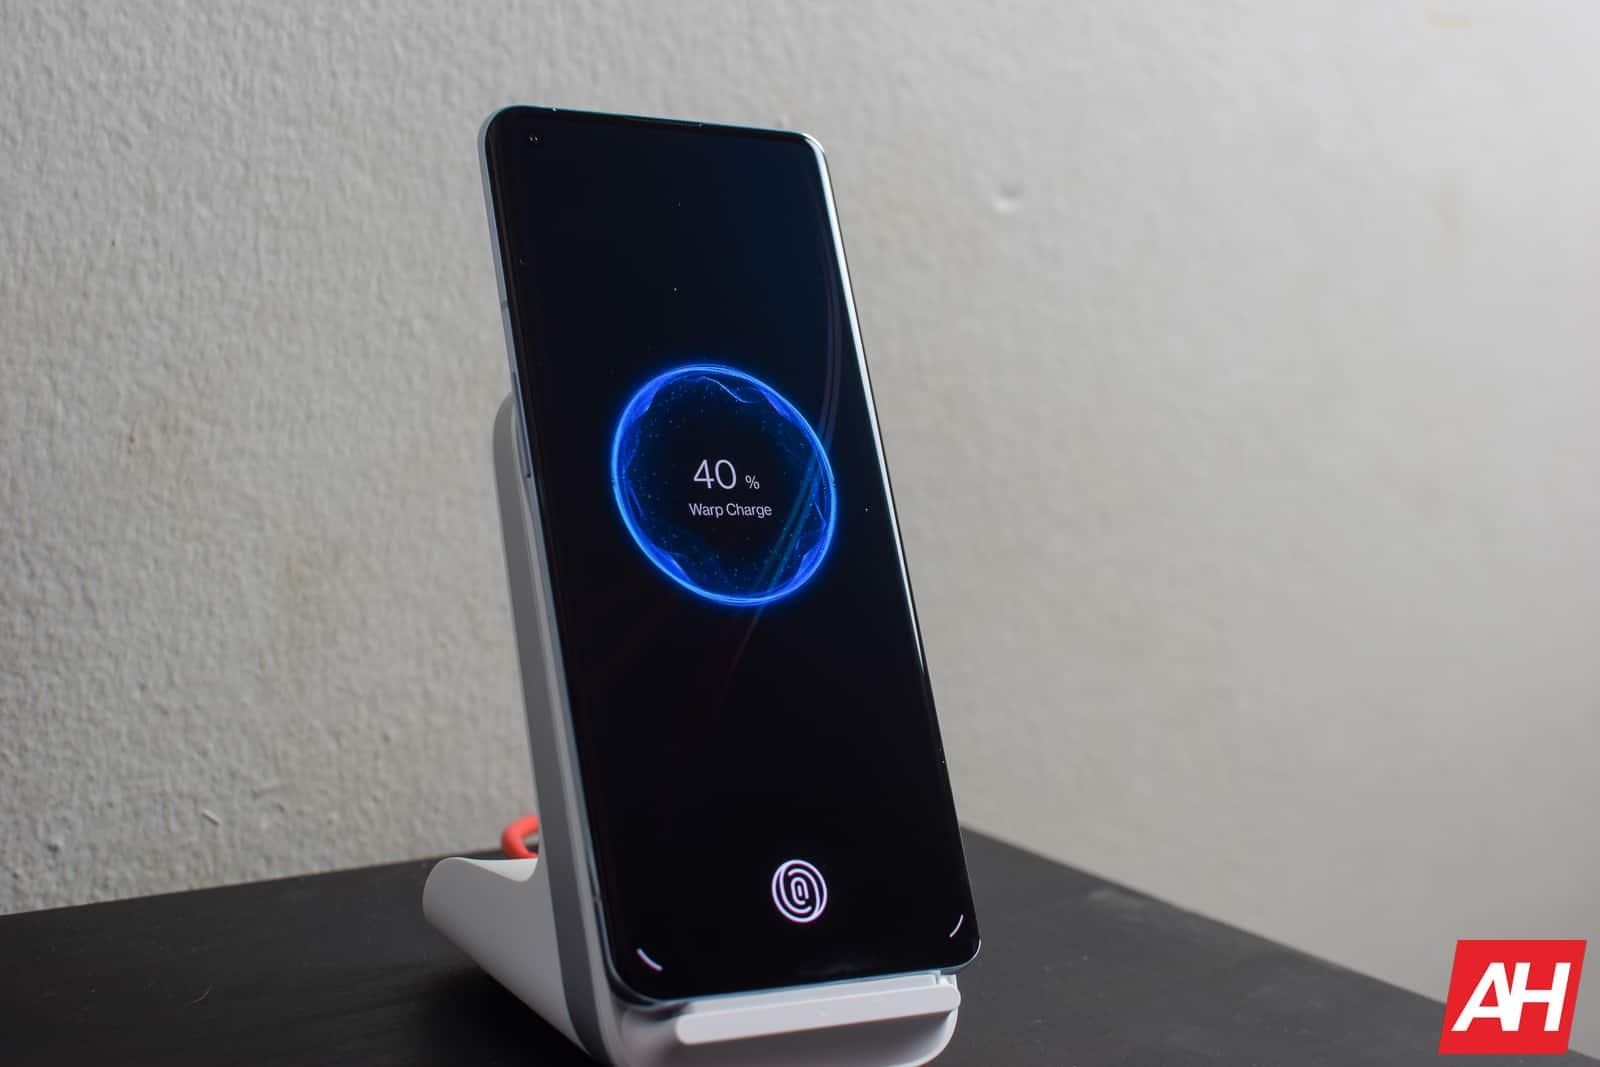 OnePlus 9 Pro Wireless Charging AM AH